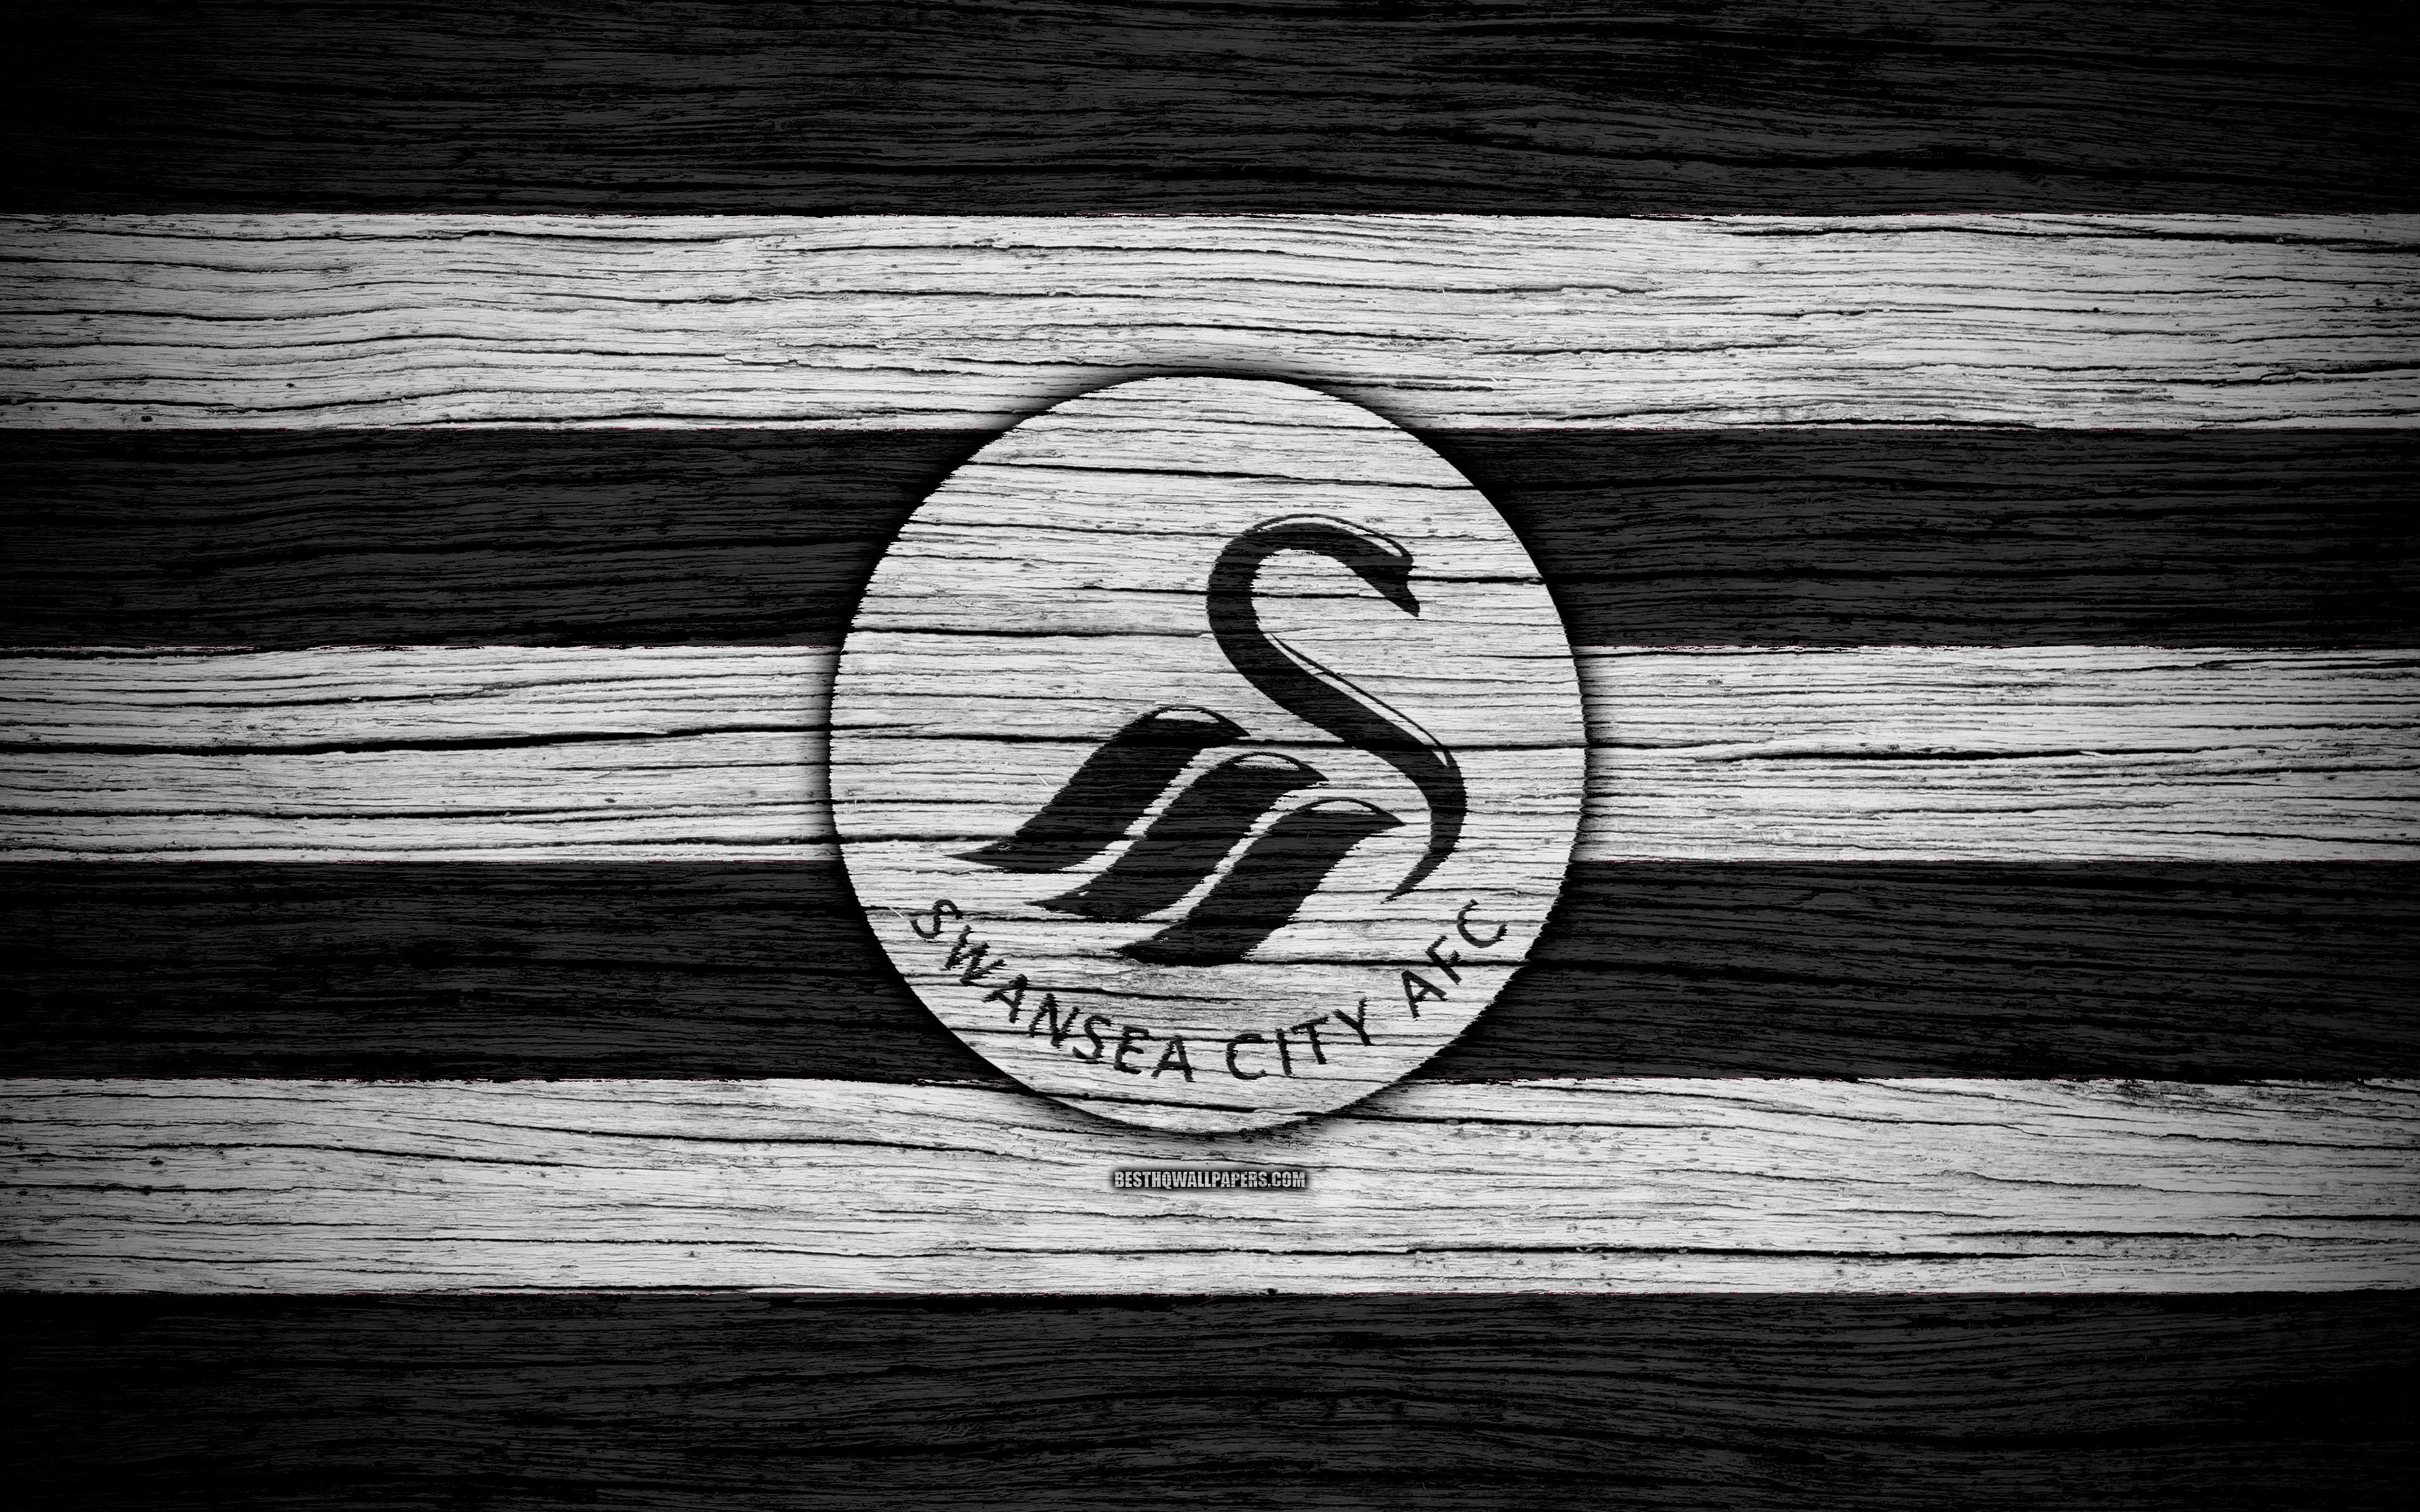 Swansea City Wallpapers - Wallpaper Cave